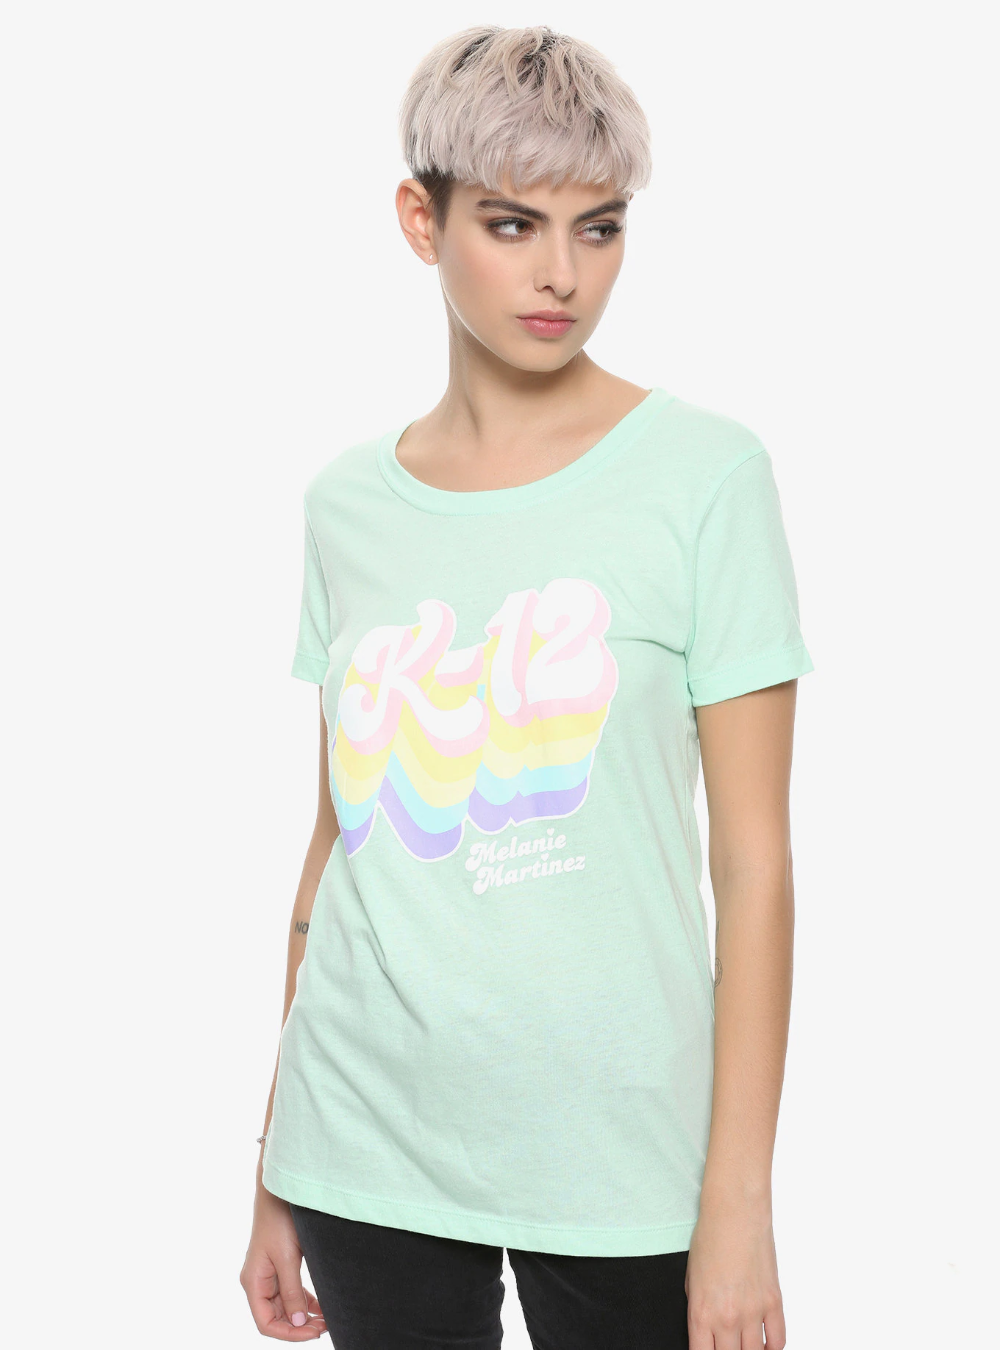 Melanie Martinez K12 Rainbow Logo Girls TShirt imagens)